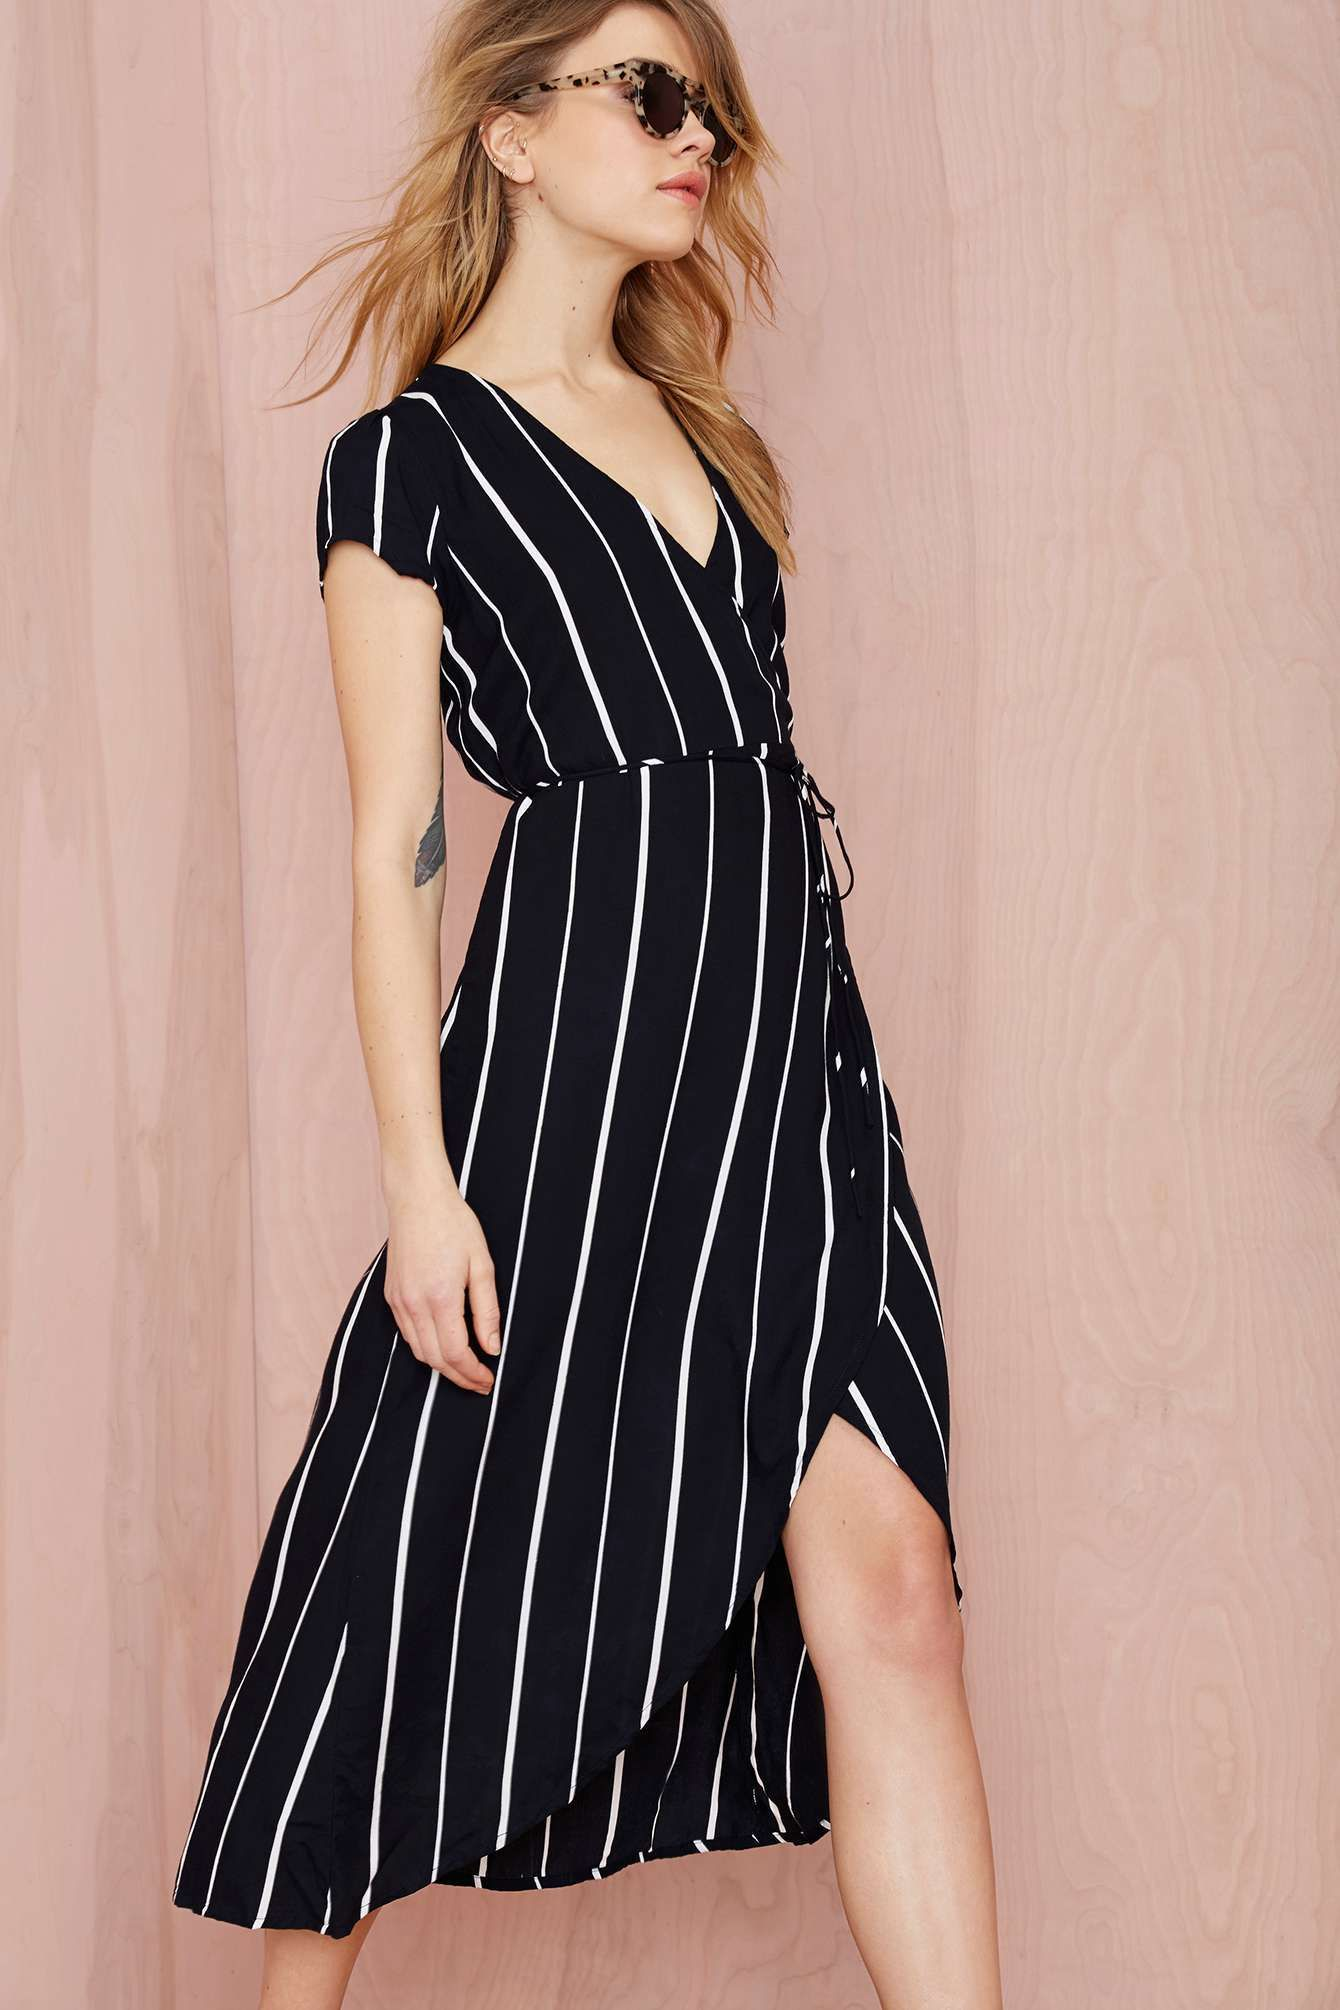 Faithfull Lulu Wrap Dress | Fashion | Pinterest | Vestiditos, Locos ...